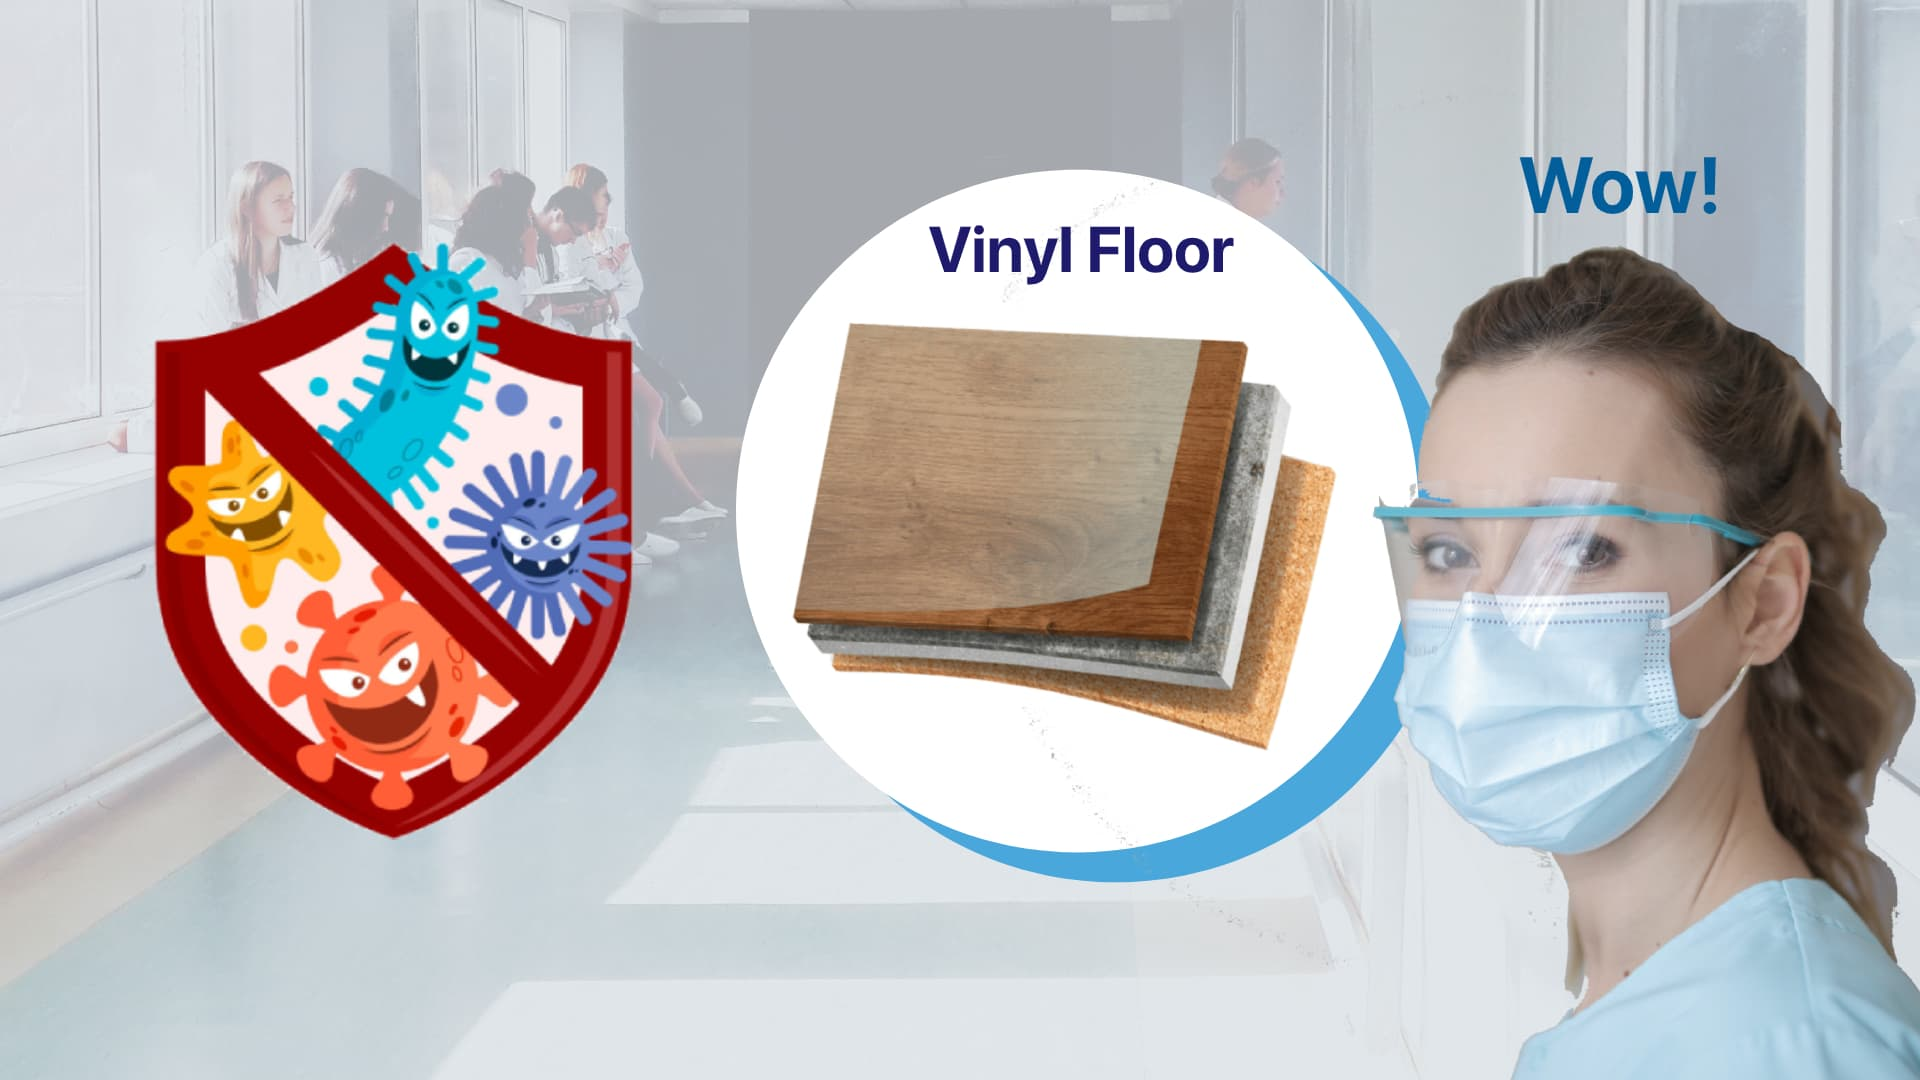 ZMARTBUILD Vinyl Floor for hospital use